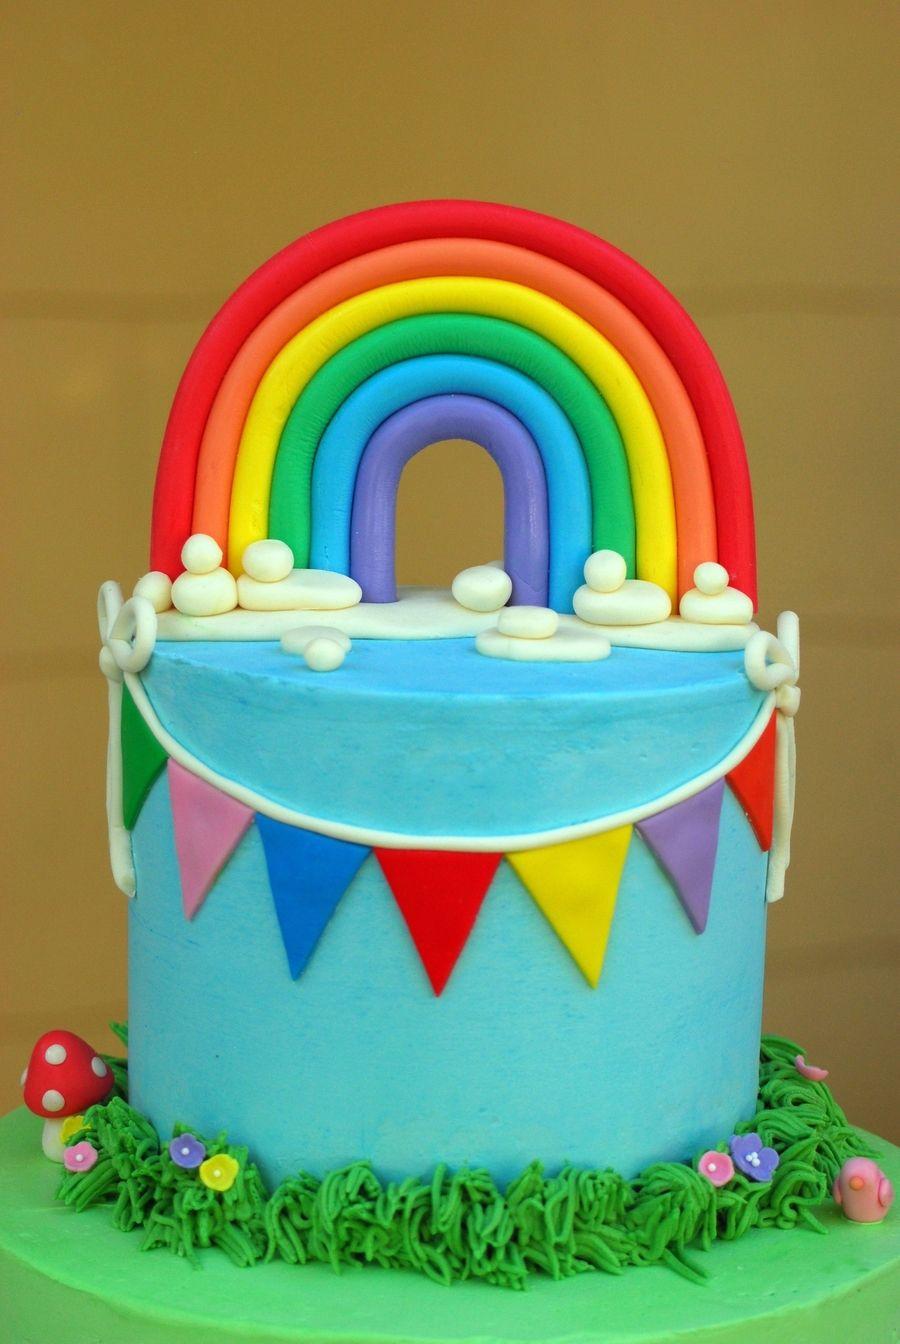 rainbow baby shower cake Google Search Cakes Pinterest